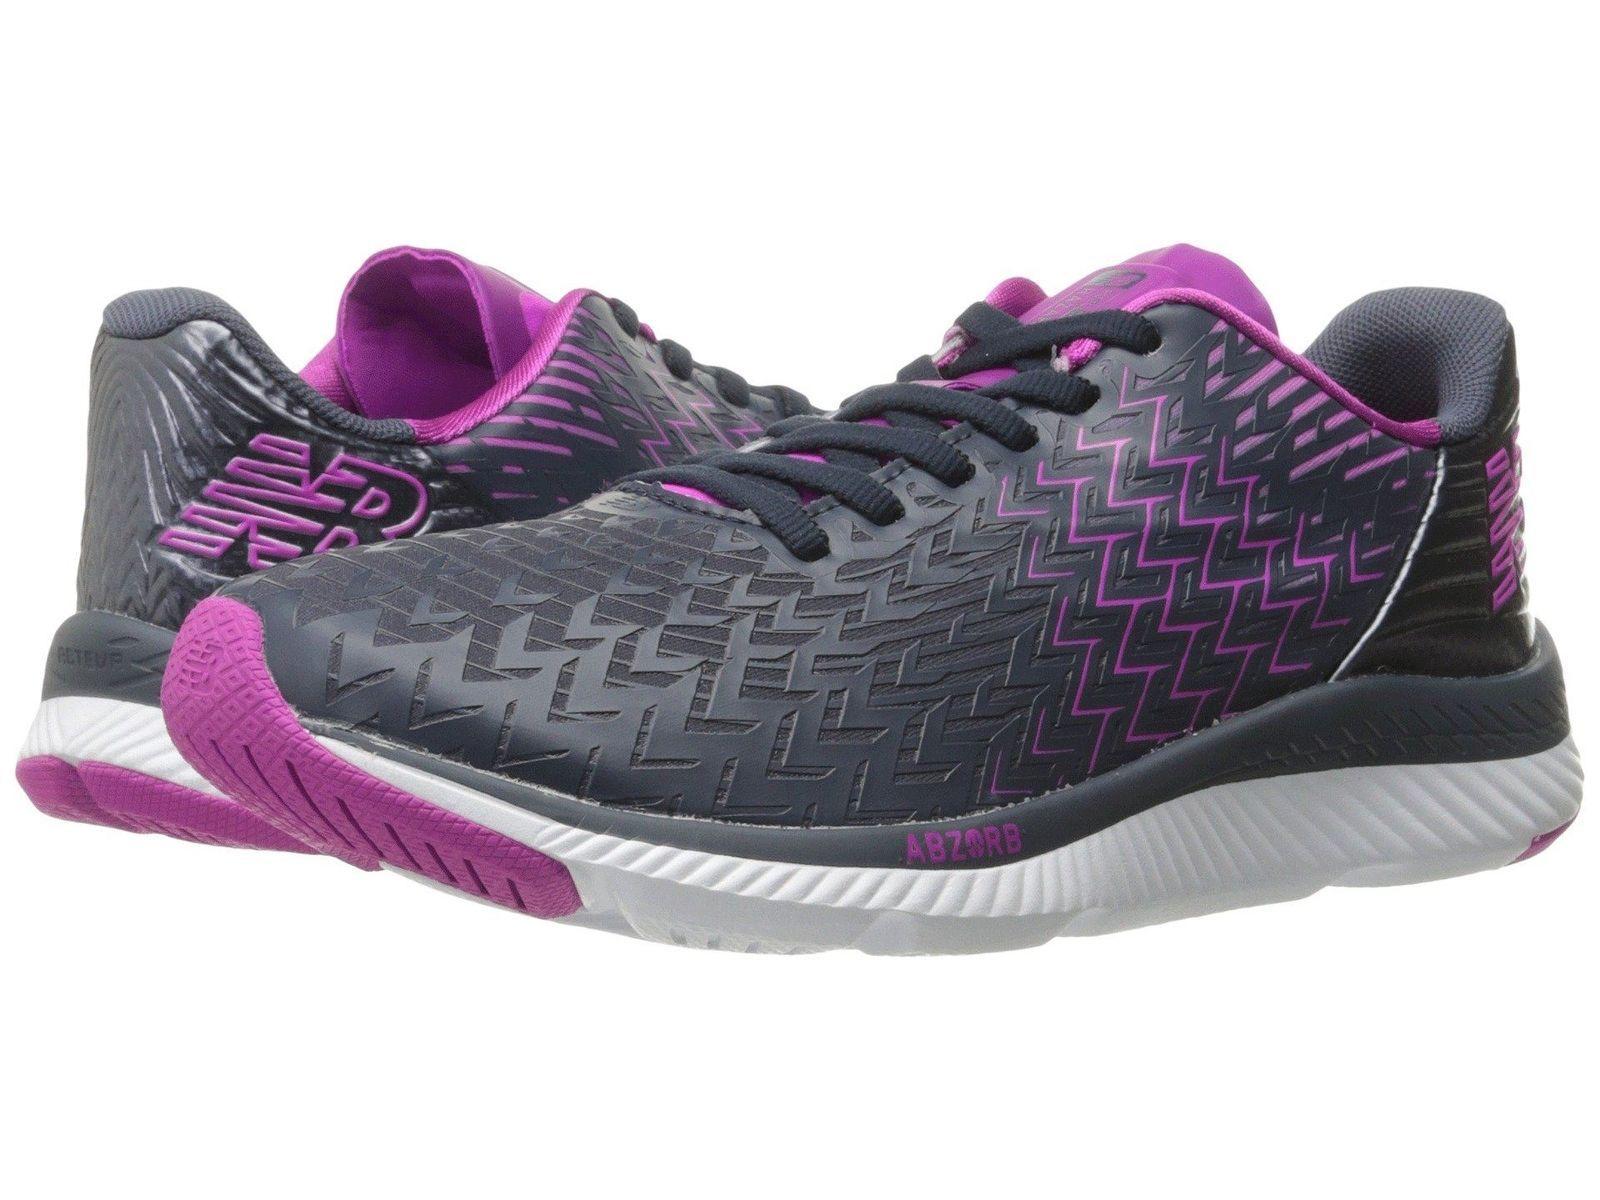 New Balance WRZHLP1 Gray/Purple Women's Running Shoes